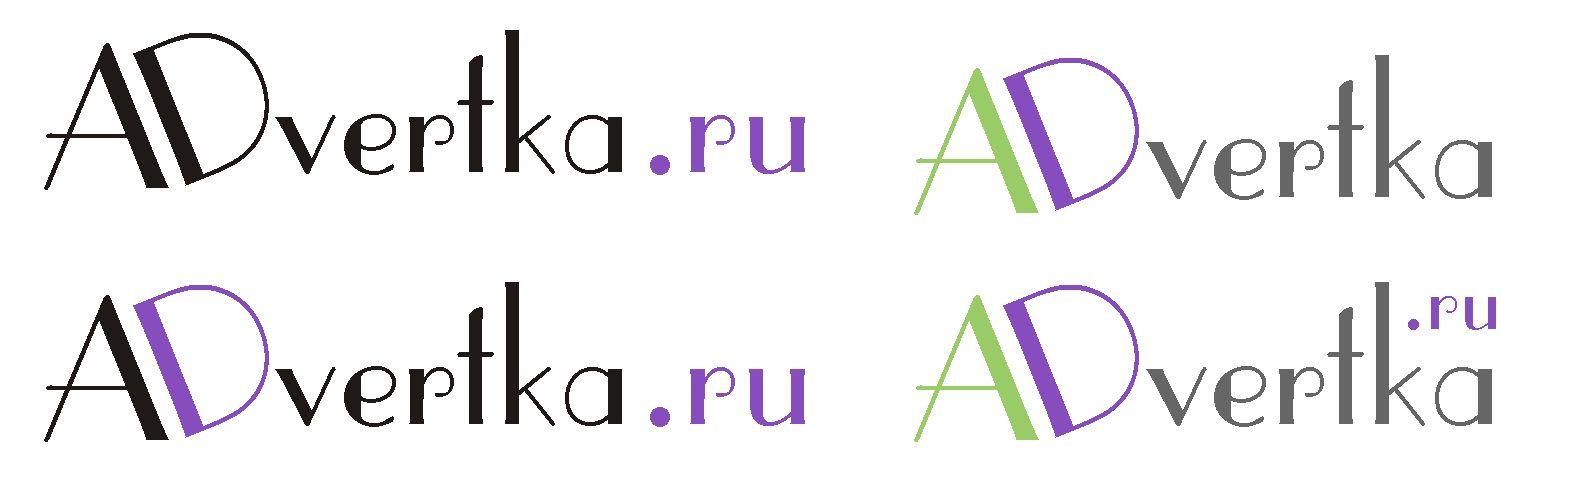 логотип для интернет агентства ADvertka - дизайнер Activists